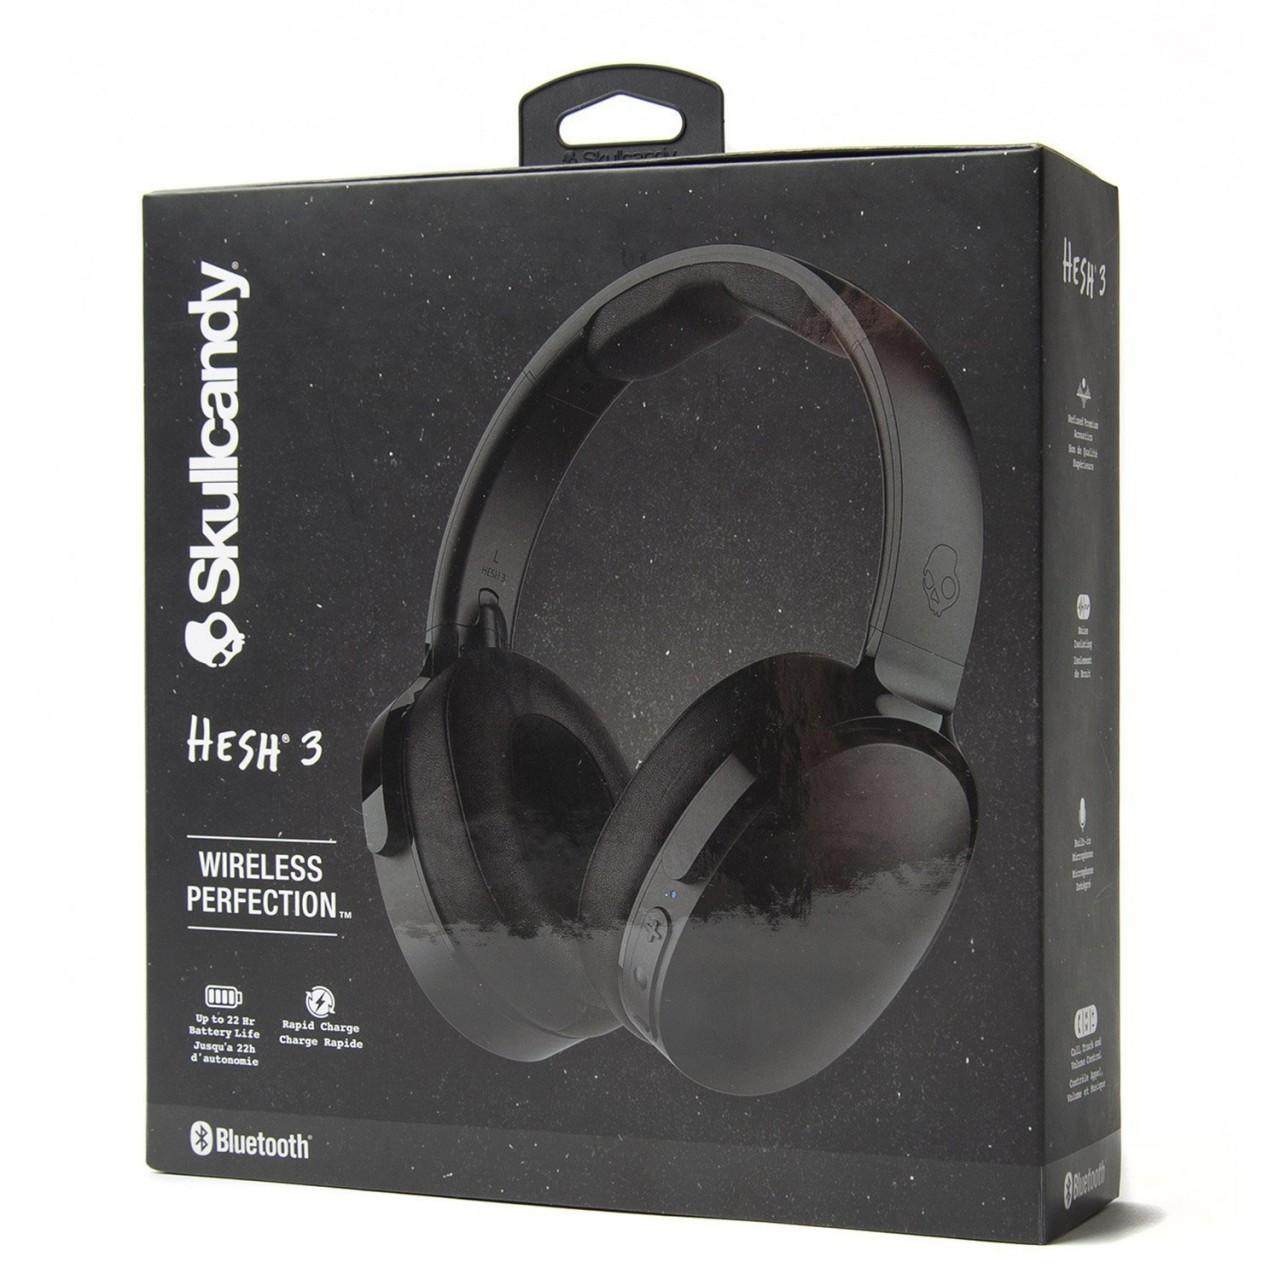 Wireless headphones pc over ear - skullcandy headphones bluetooth over ear